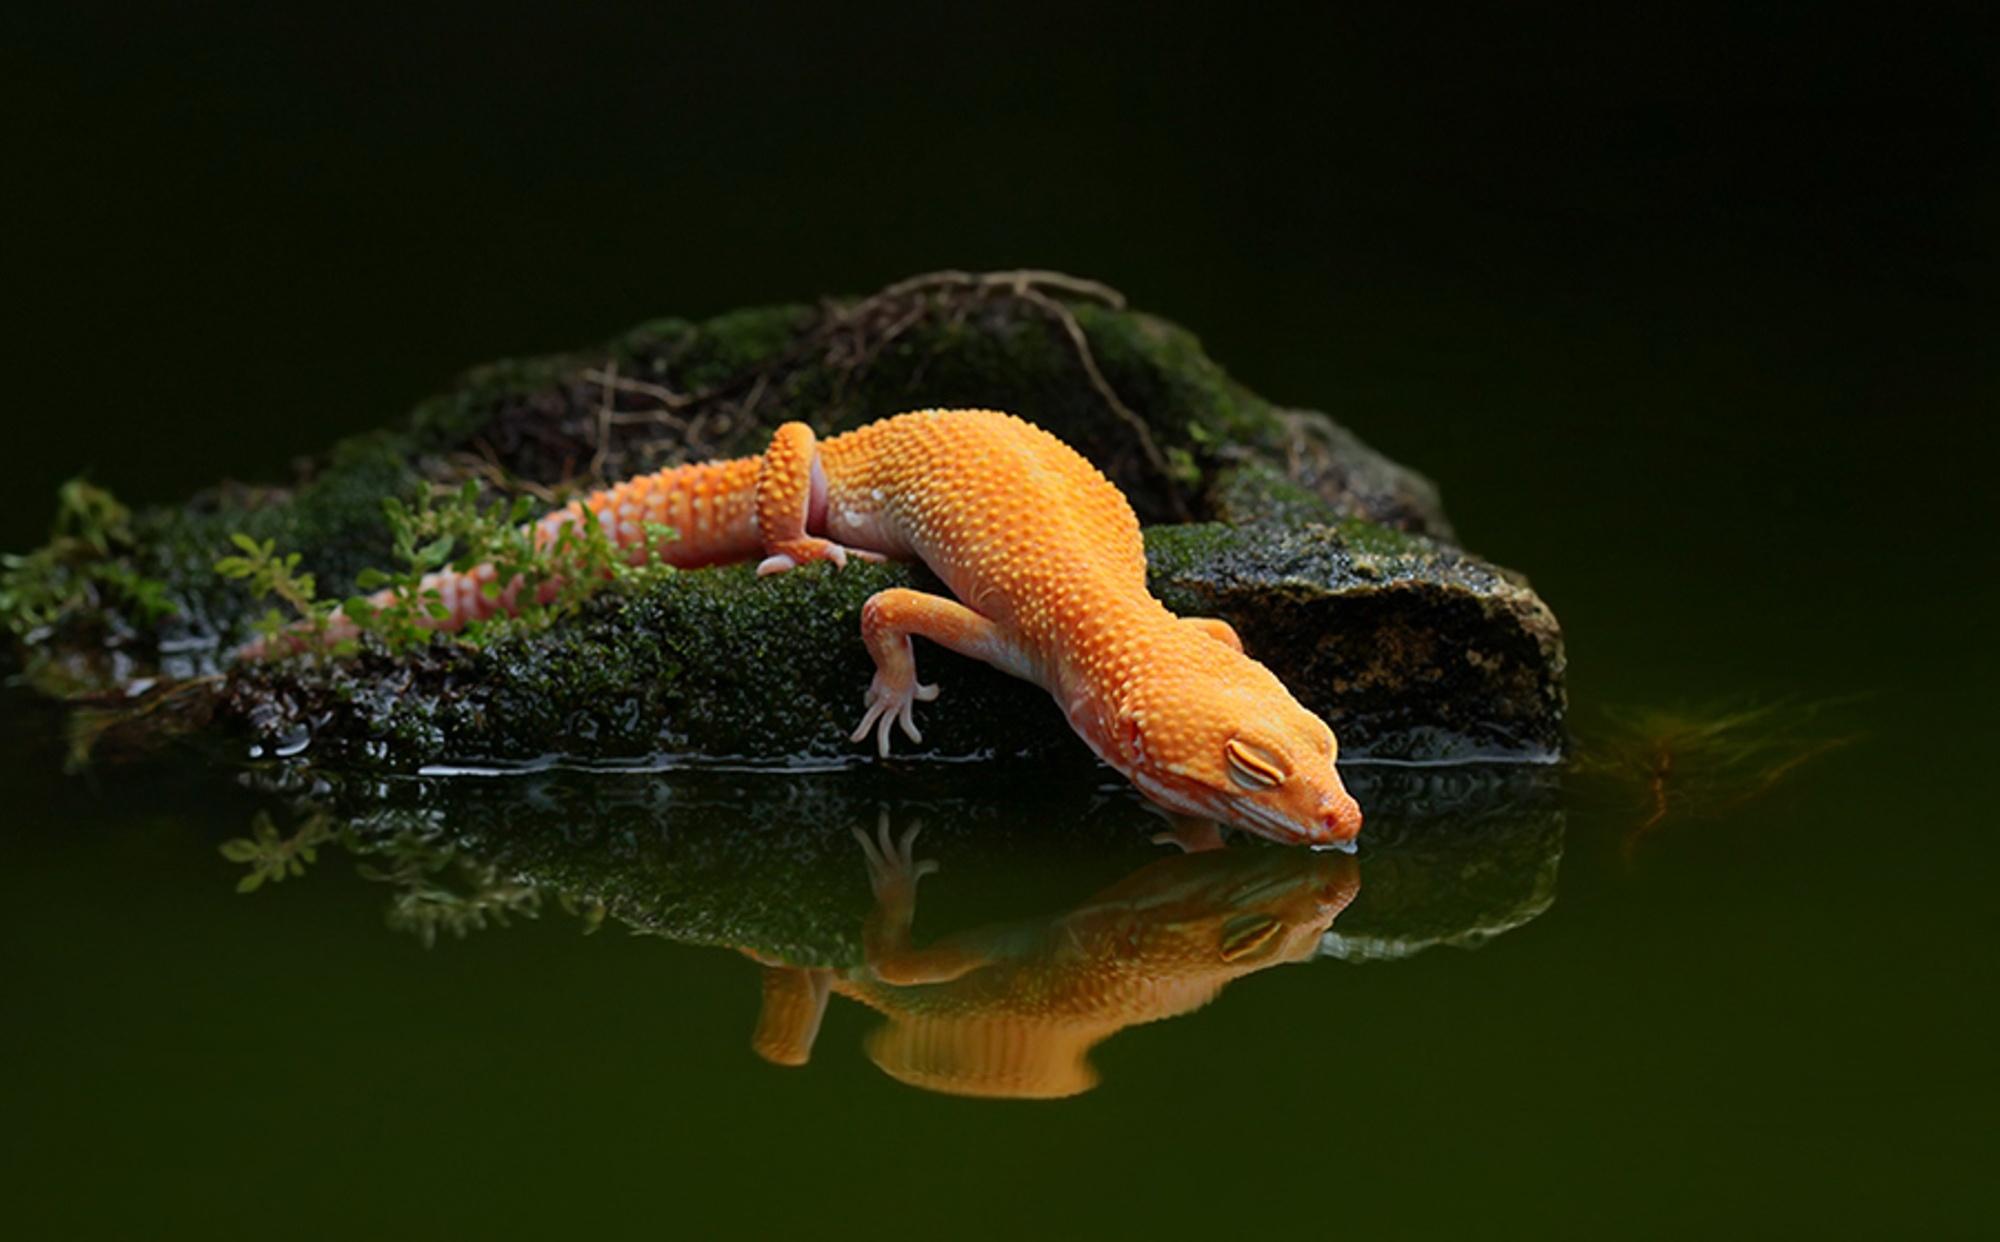 Lizard water reflection water gecko wallpaper | 2000x1242 ...